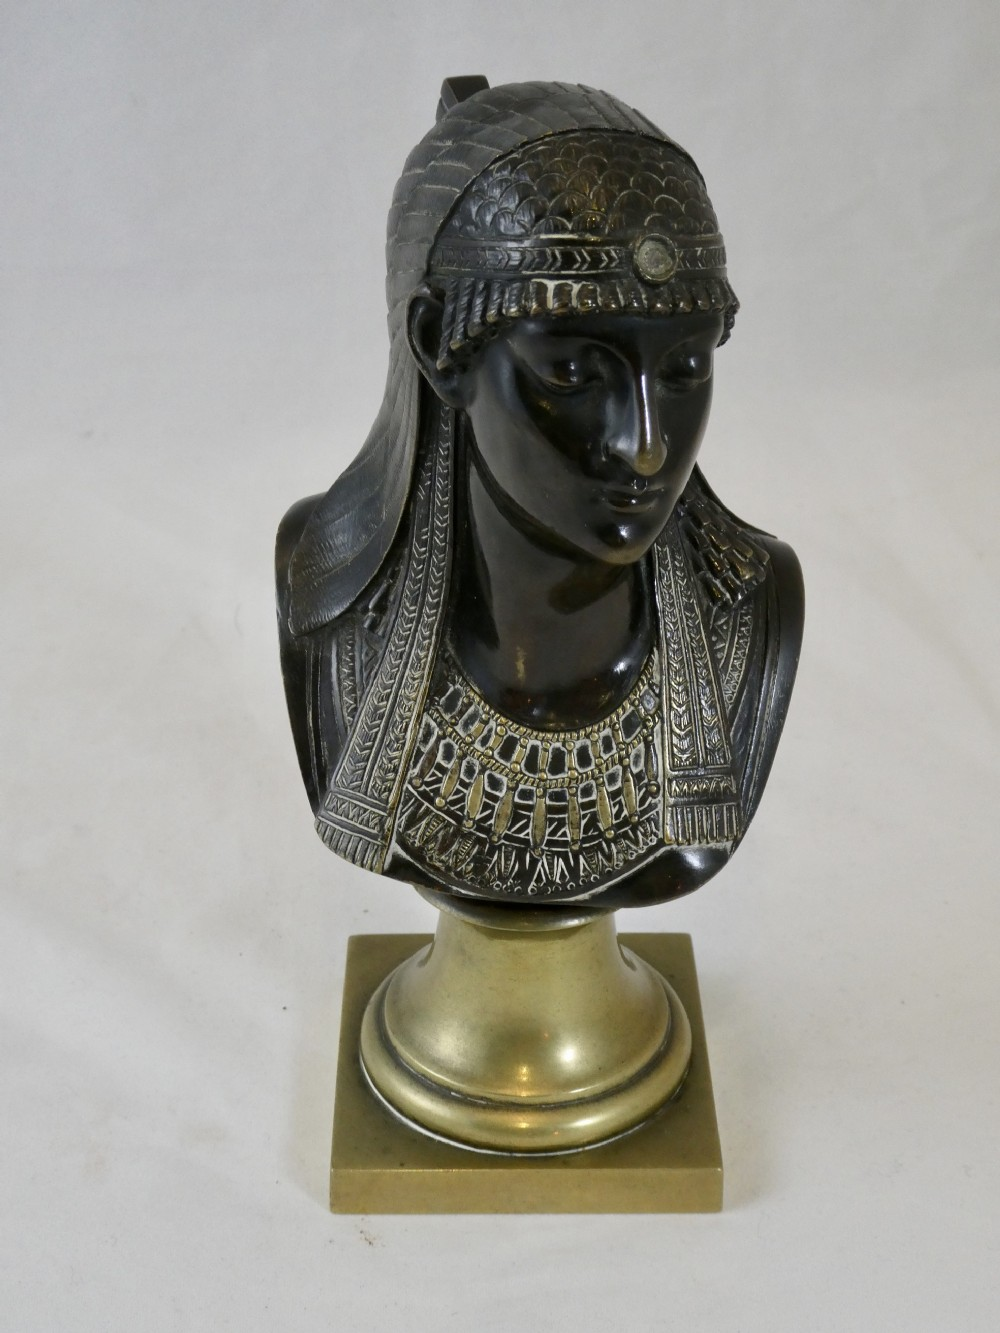 19th century bronze bust